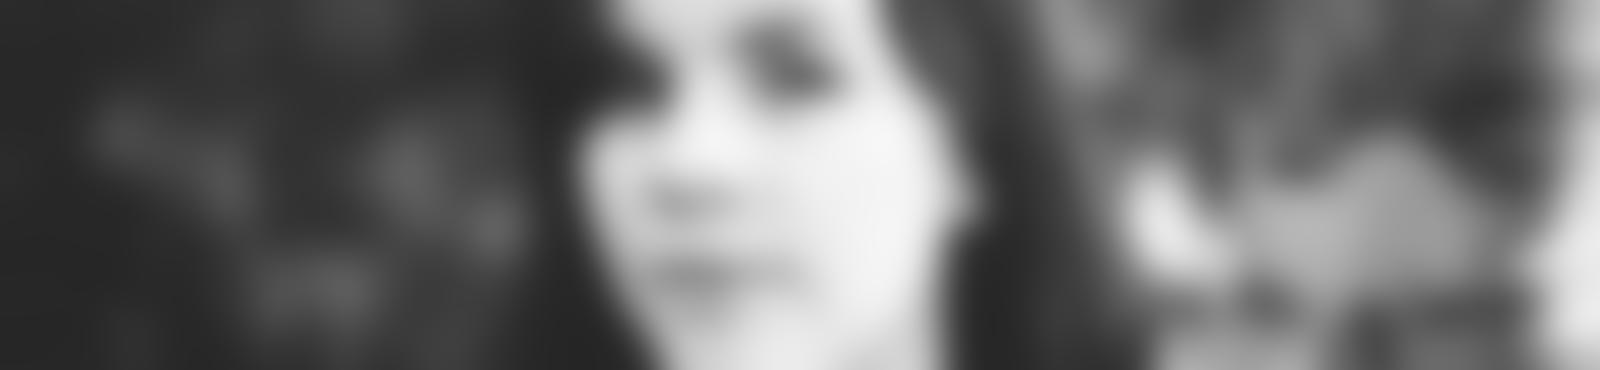 Blurred 7b410ef5 fc94 4ac3 85a9 21a571532920